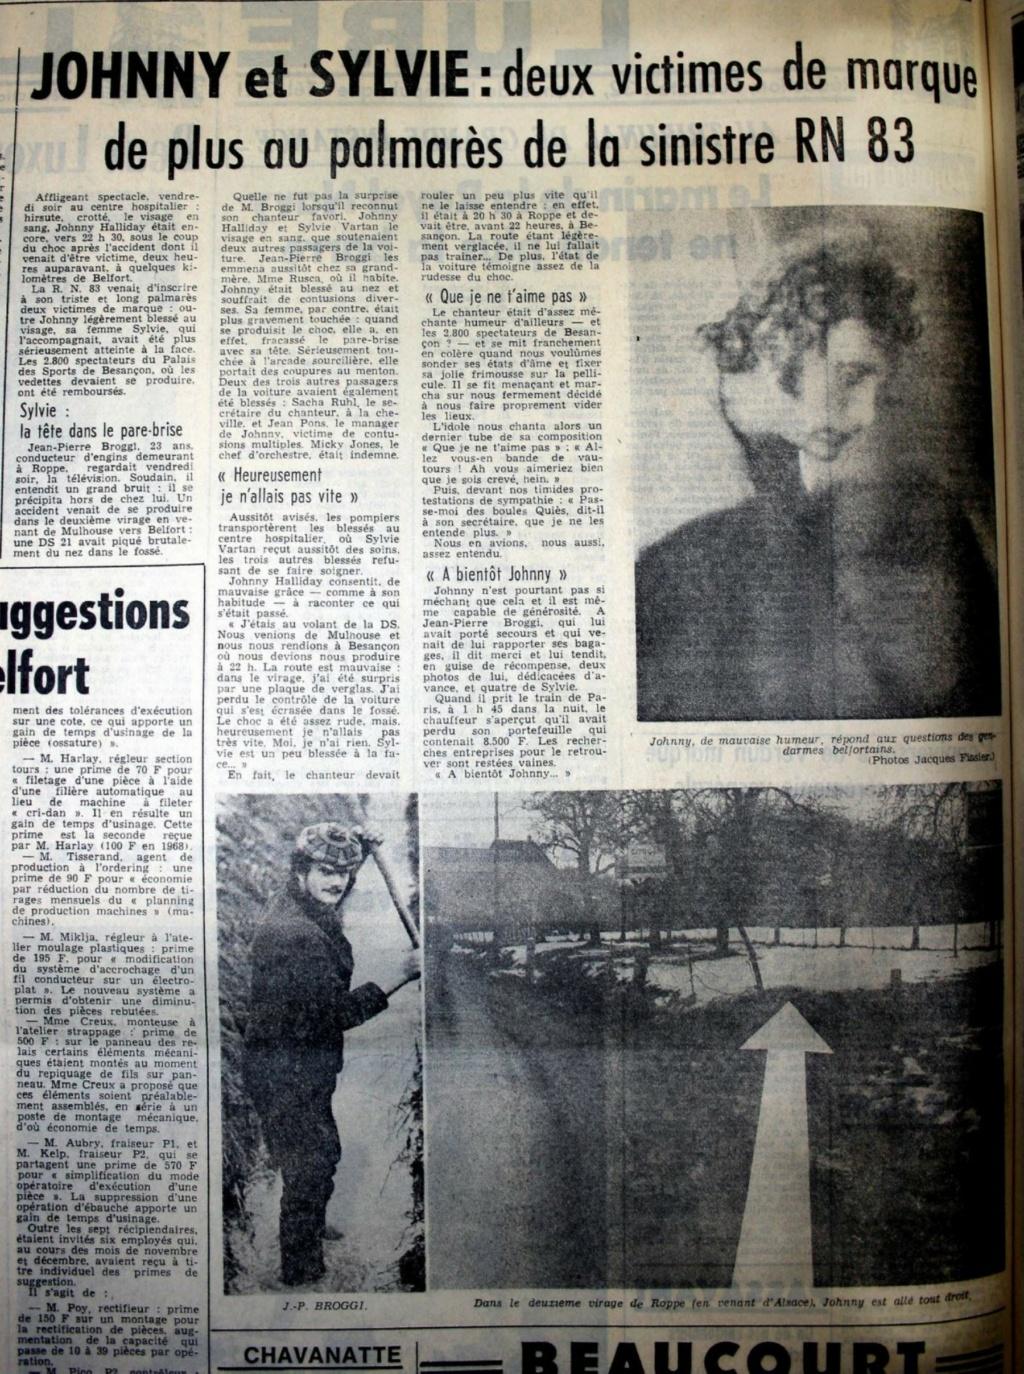 CITROËN DS 21 PALLAS DE JOHNNY HALLYDAY ( 1969 ) L-arti10